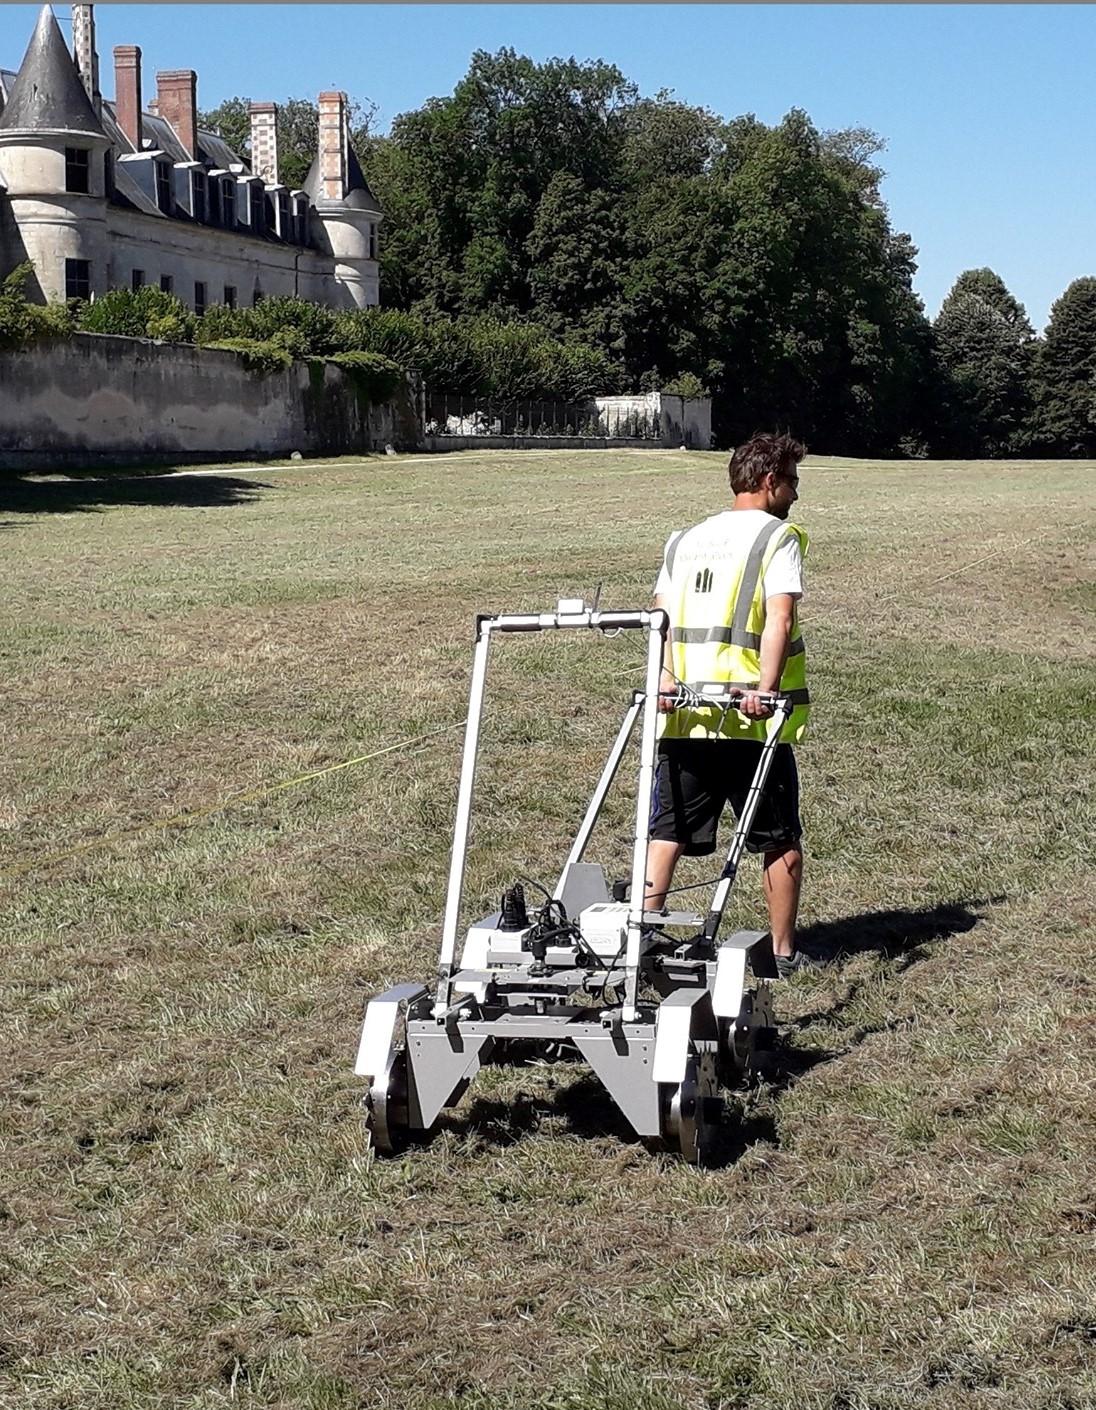 Villers-Cotterêts kastély geofizikai vizsgálat